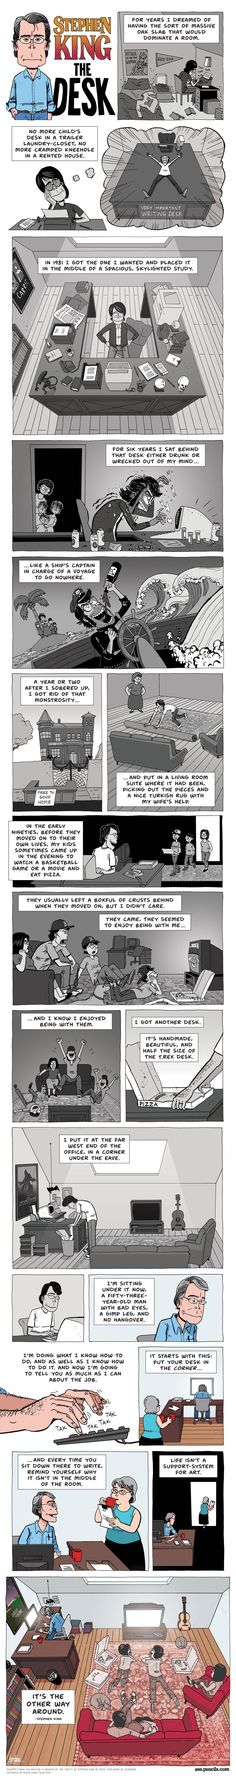 Stephen King on Life and Art #memes